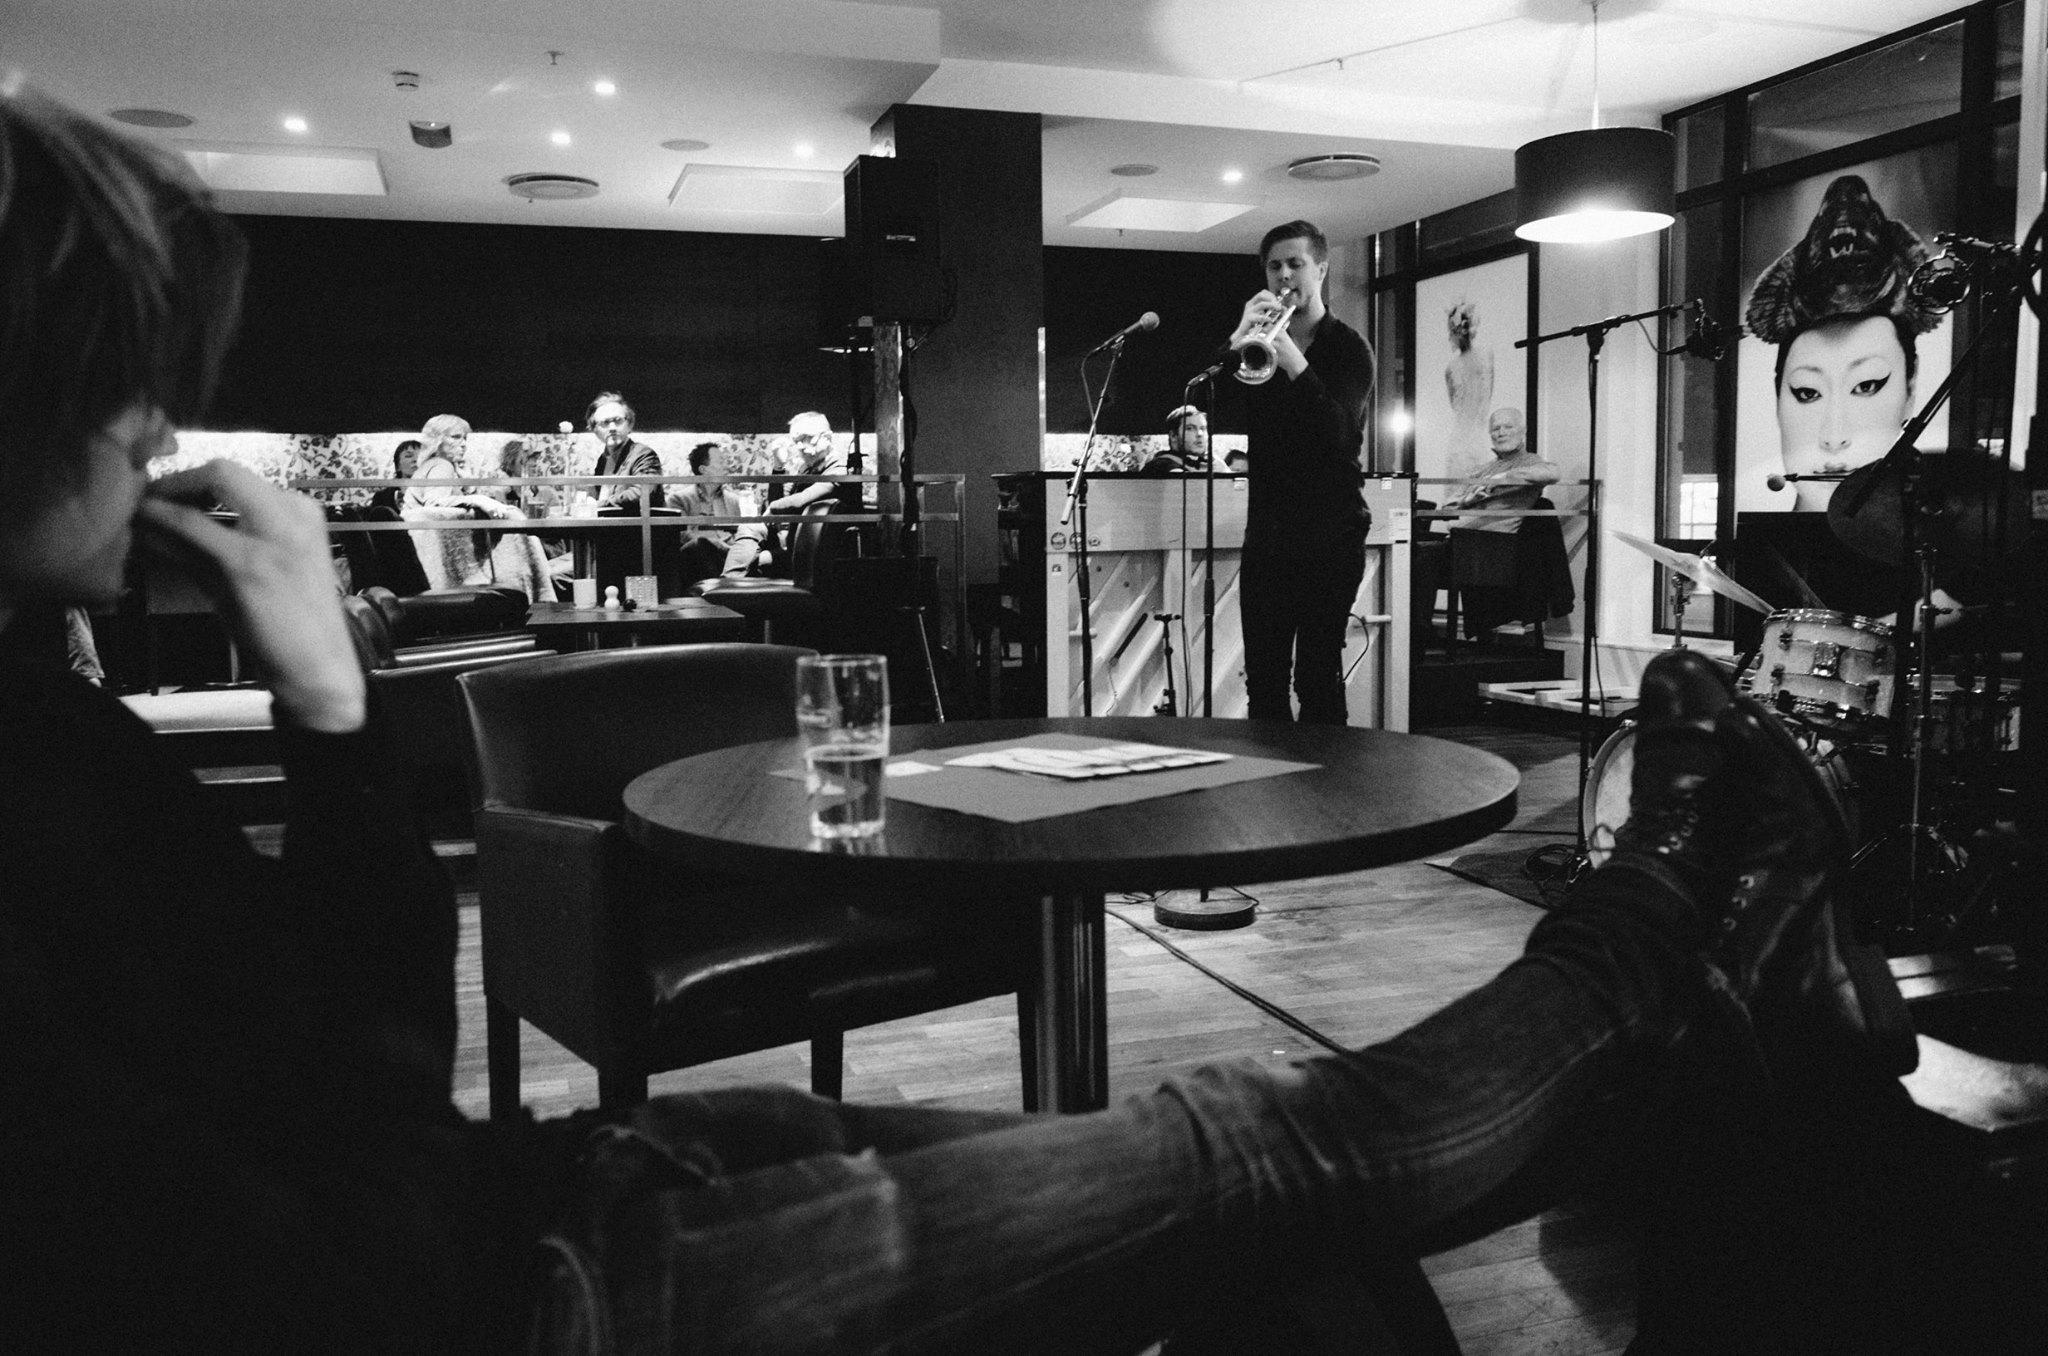 Friday night @ Jazzsirkelen, Ålesund